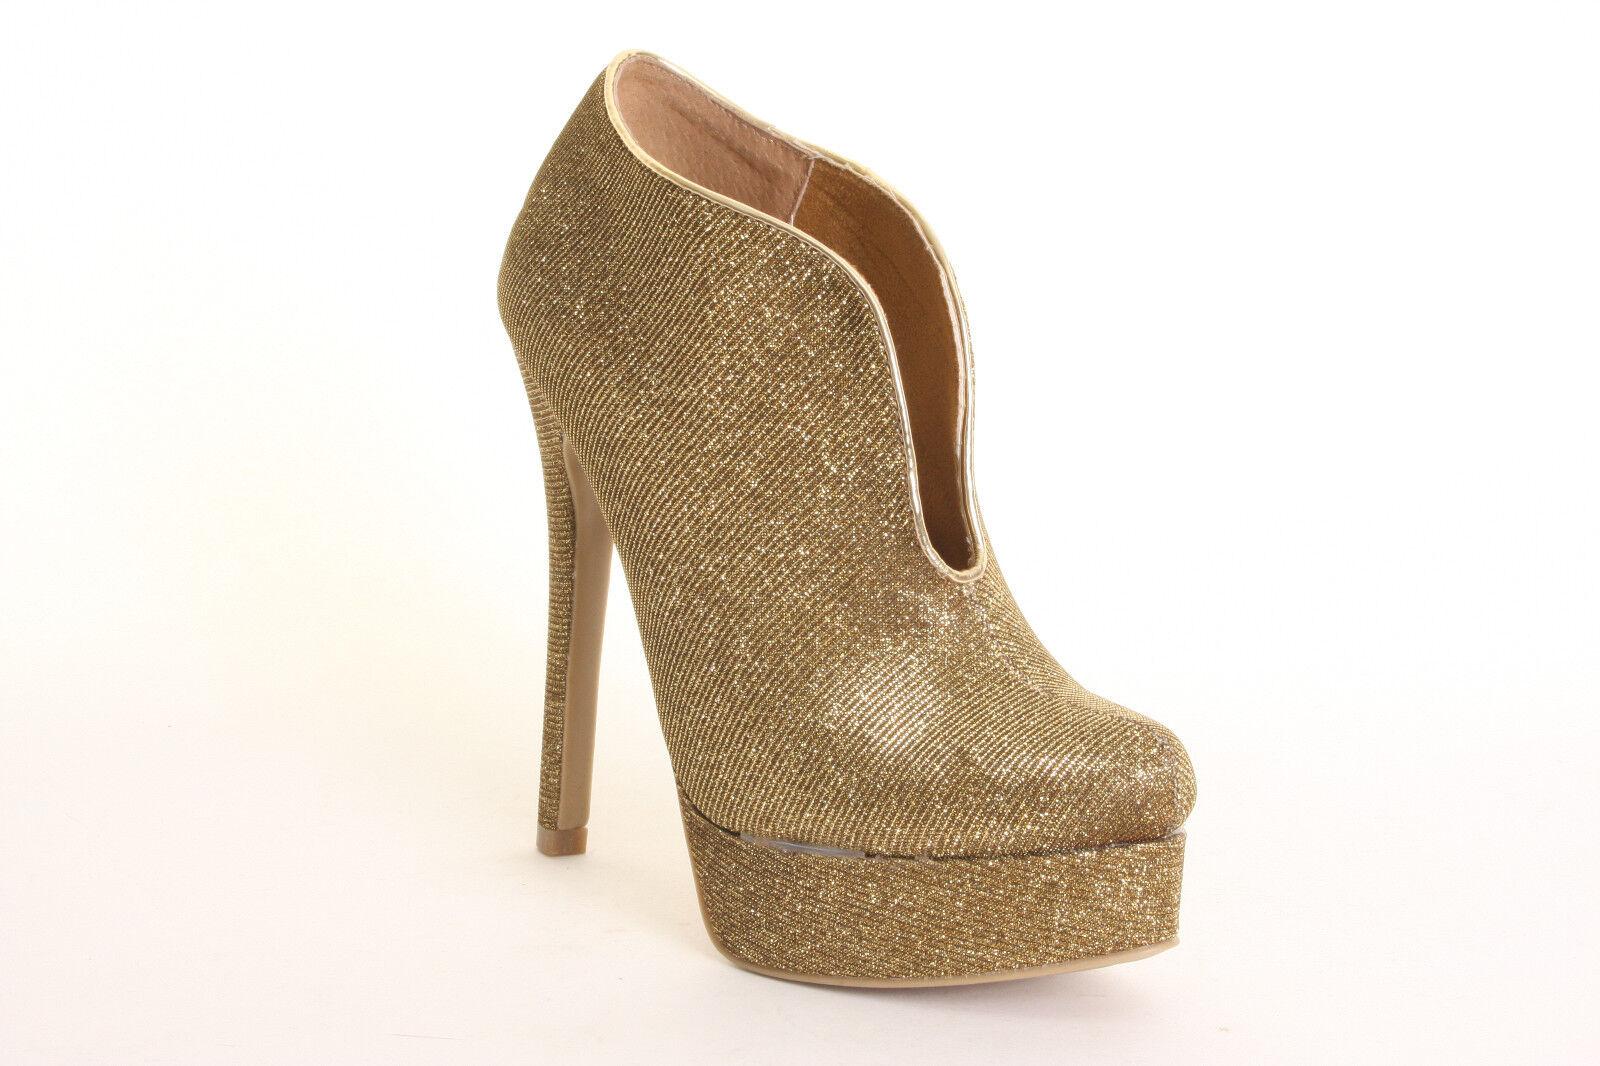 Chinese Laundry Lickety Split Glittery Gold Platform High Heel Ankle Boots 6 NIB